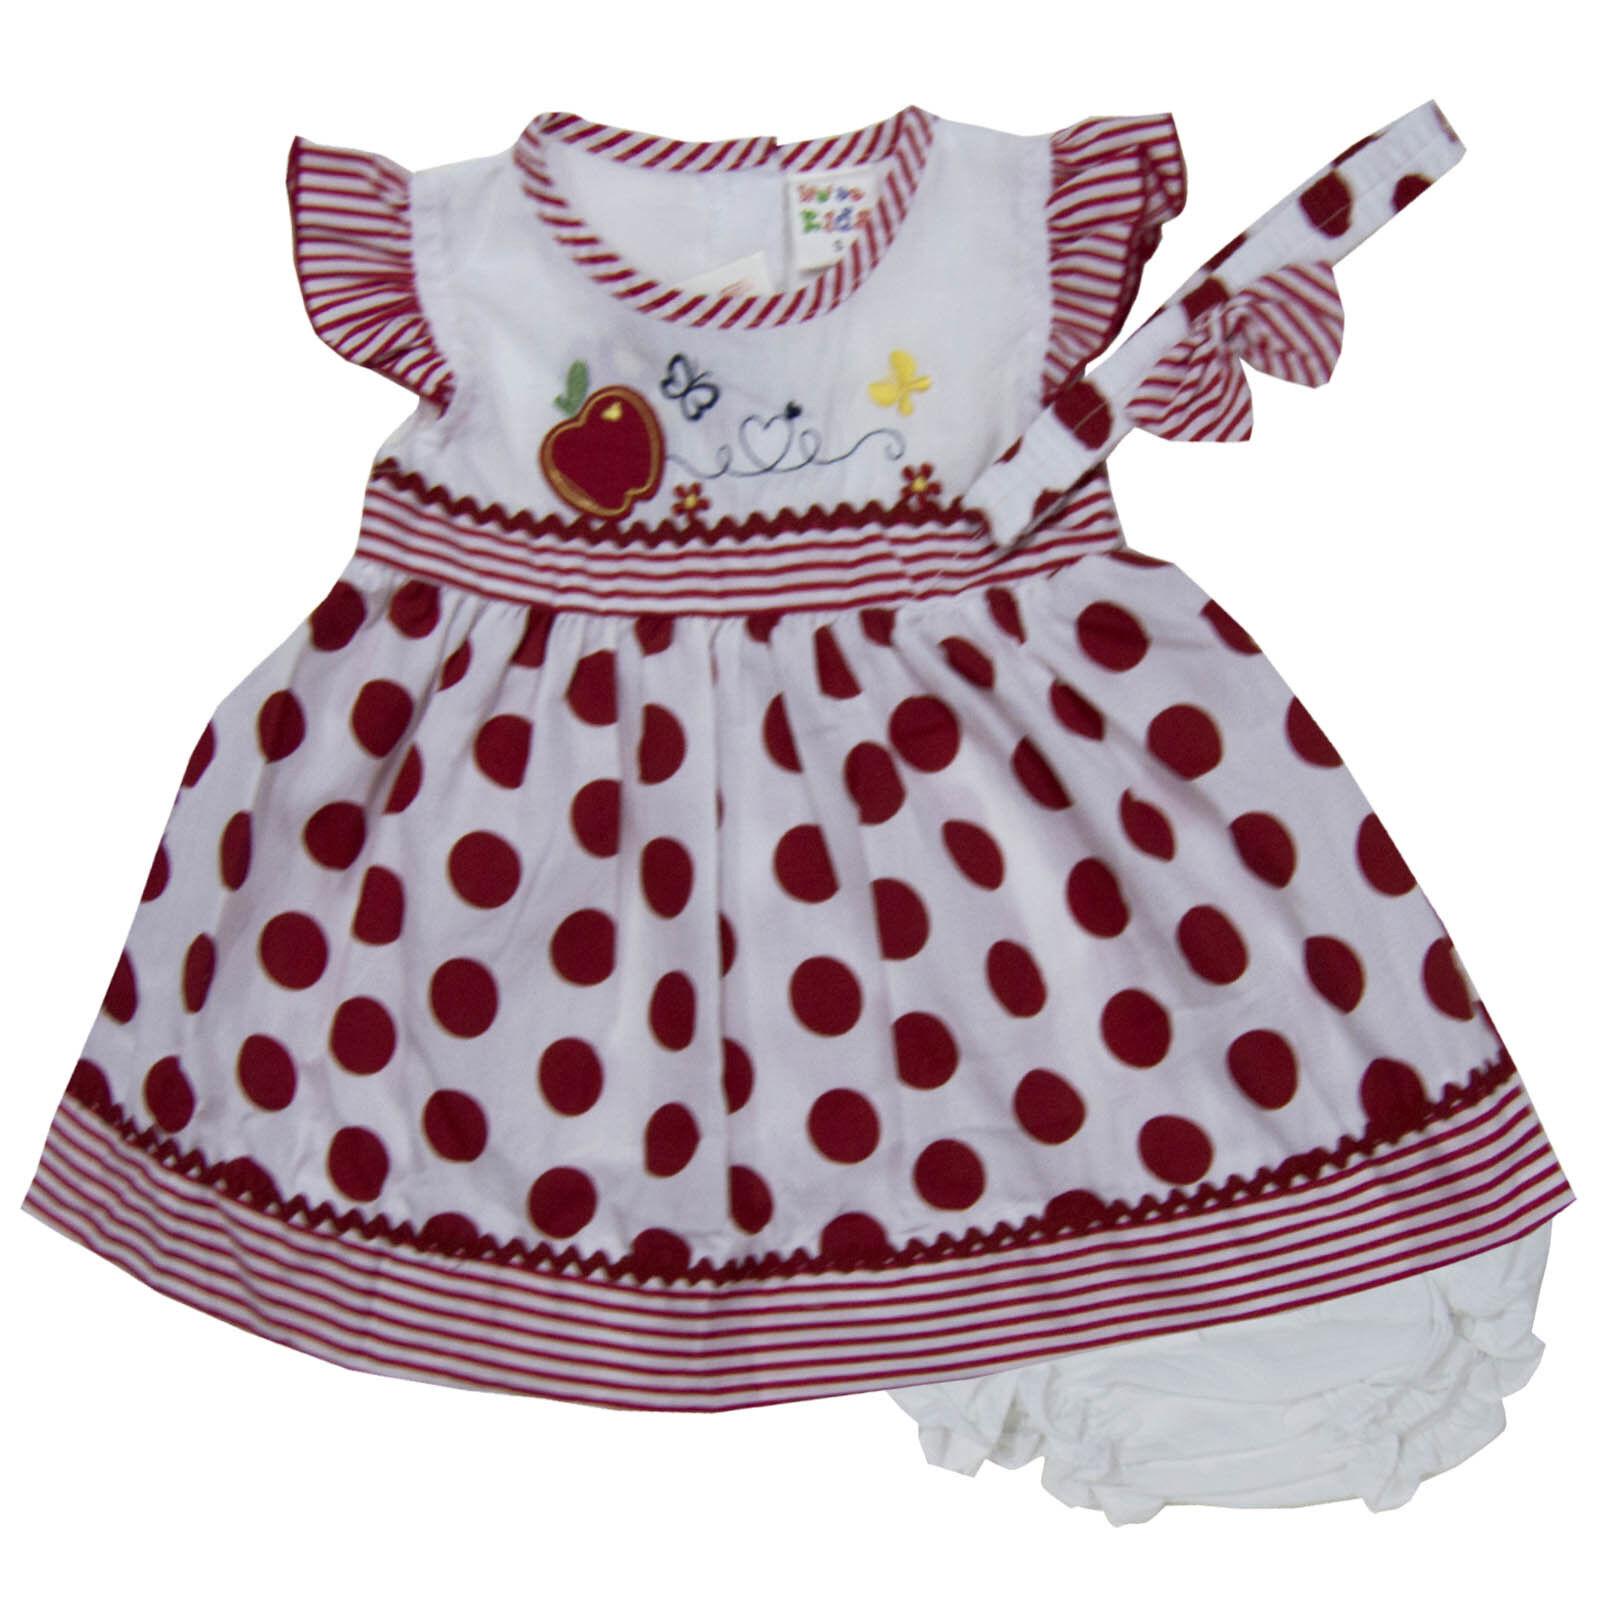 Infant Girls Dresses Sz 3-6 And 6-9 Months Girls' Clothing (newborn-5t)